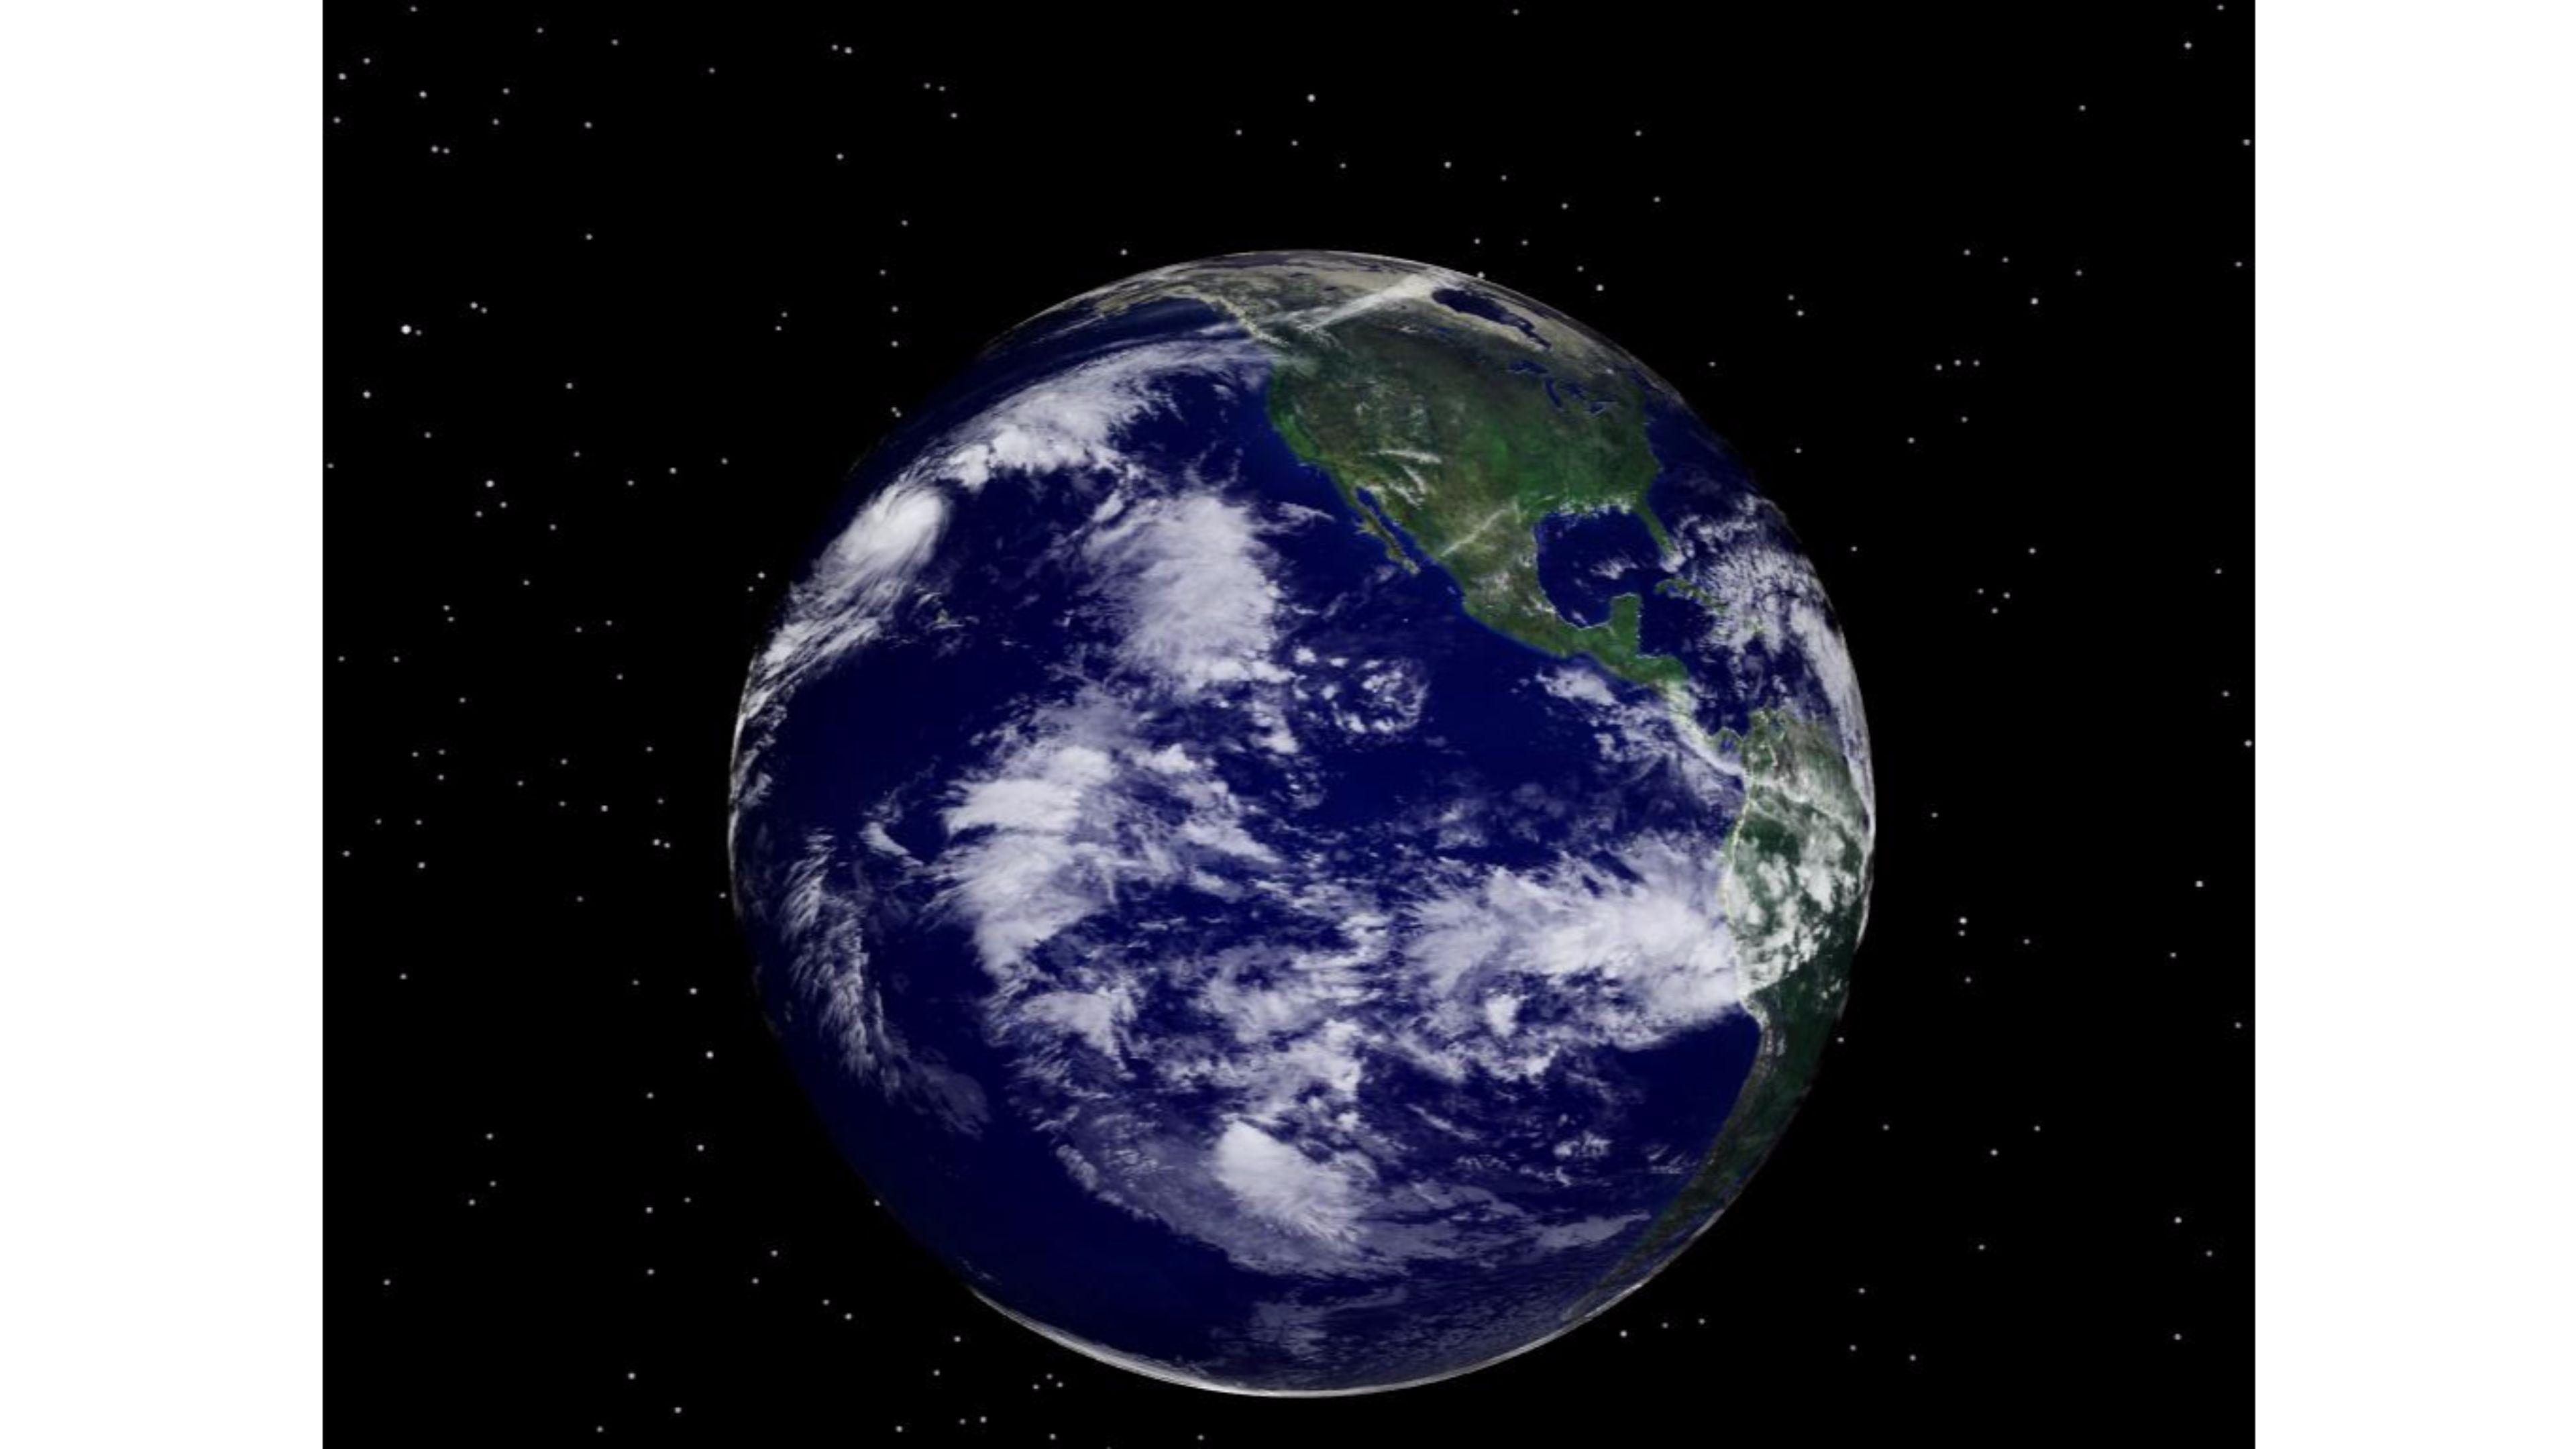 Water Planet Earth 4k - High Definition Wallpaper